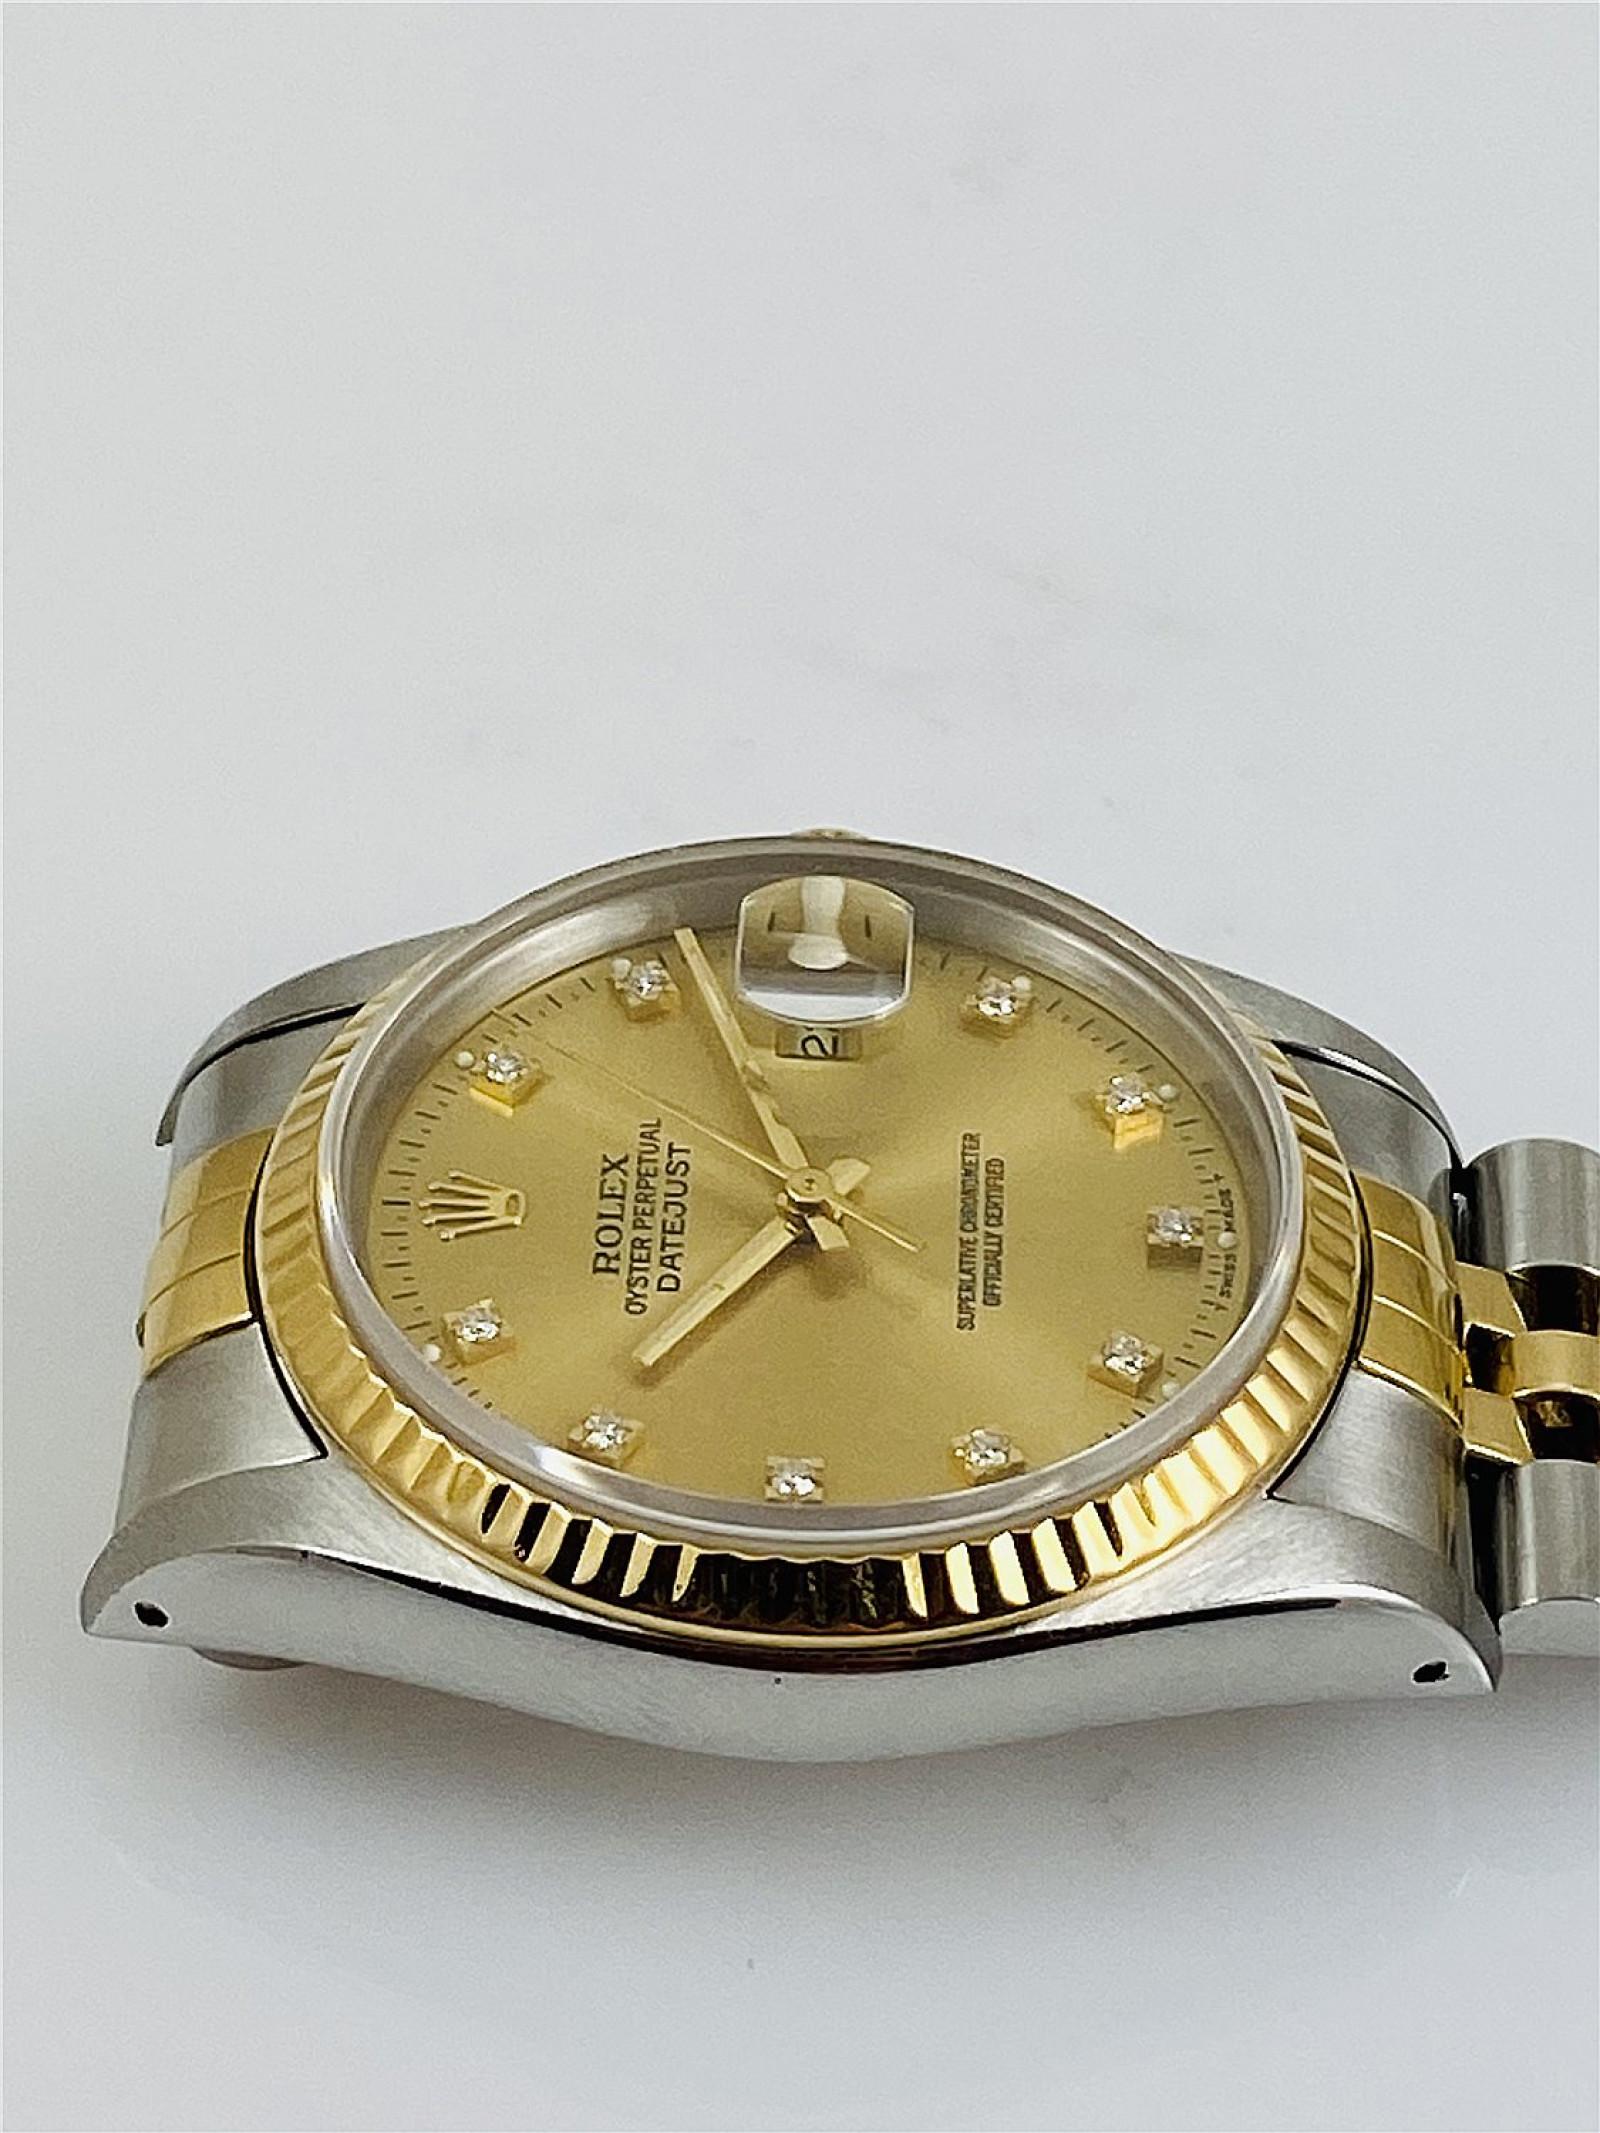 Diamond Rolex Datejust 16233 with Jubilee Bracelet